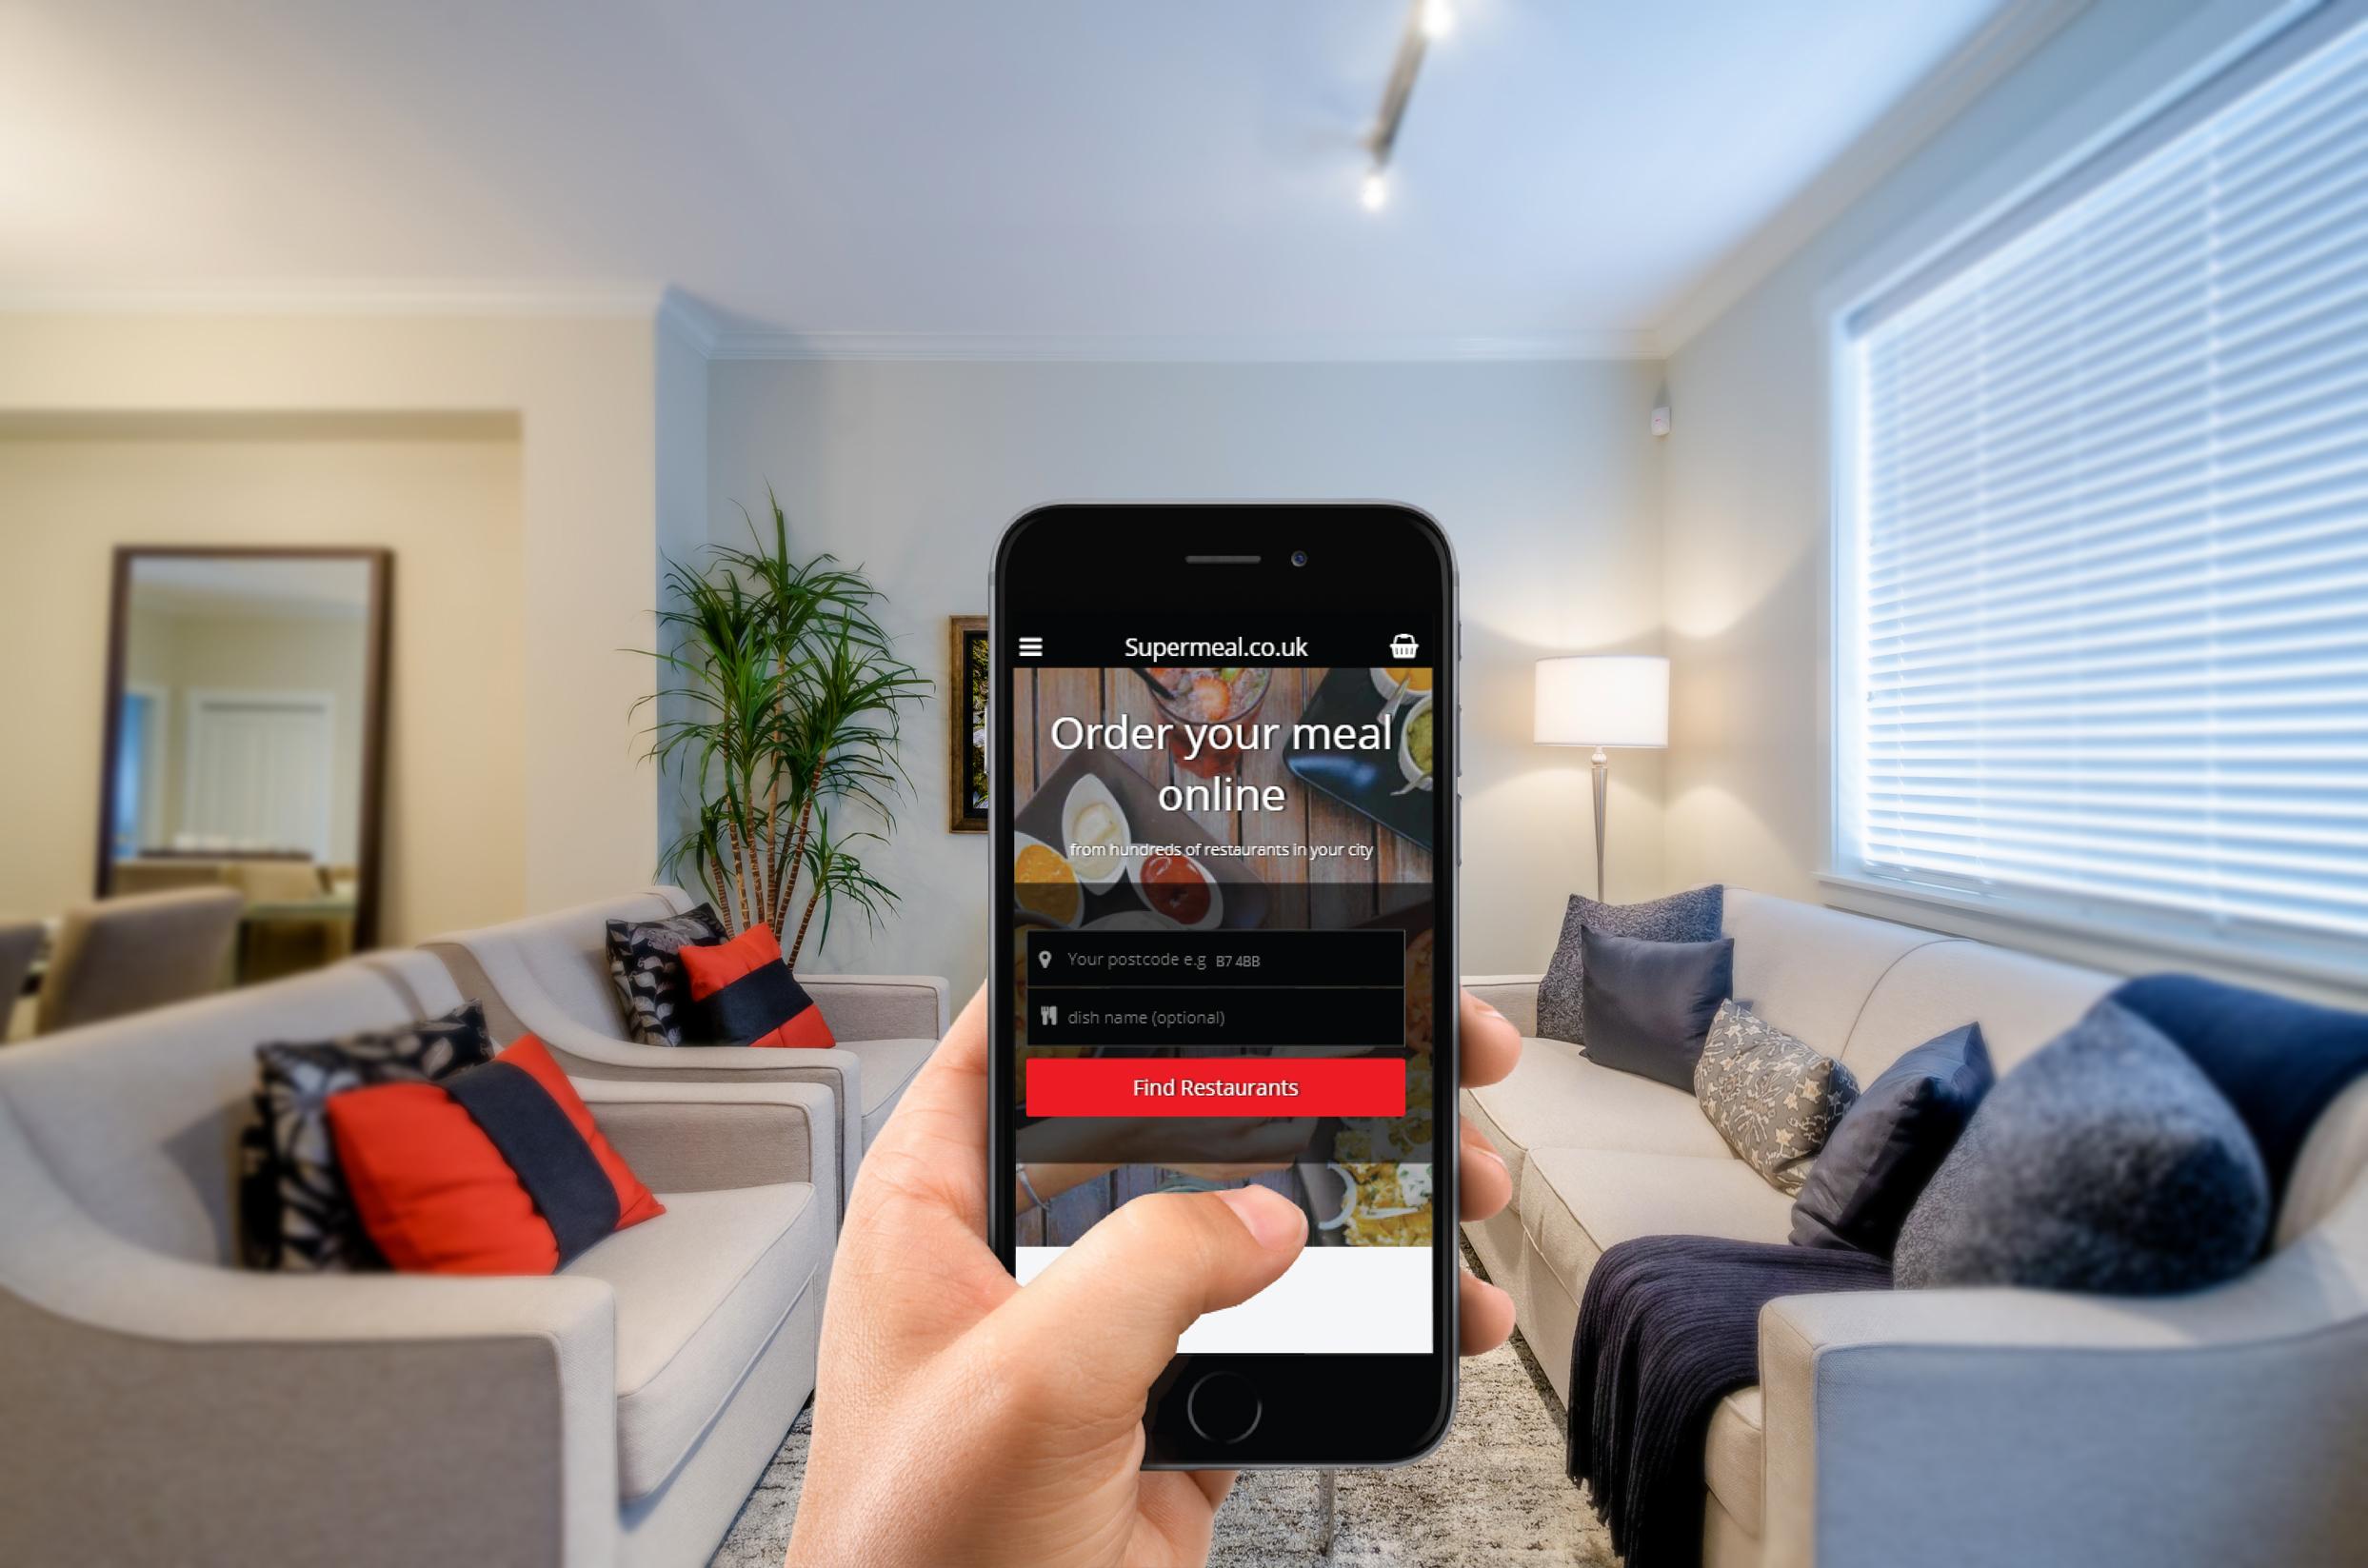 International tech company Supermeal, choose Birmingham  to launch new take-away app